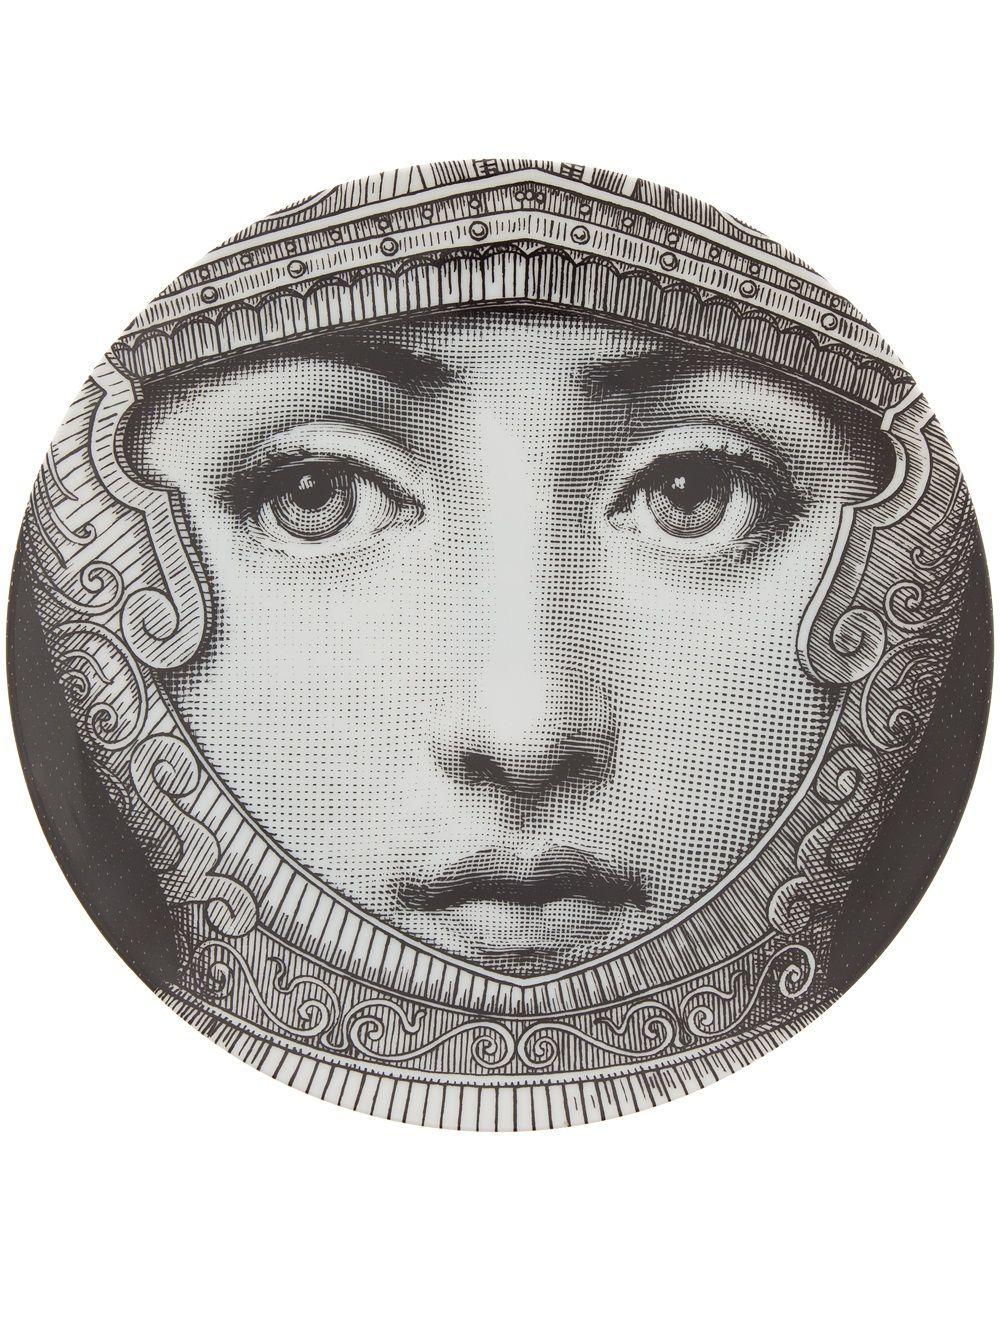 Fornasetti Art Prints Fornasetti Plate Roman Helmet Piero Fornasetti And Ceramic Design